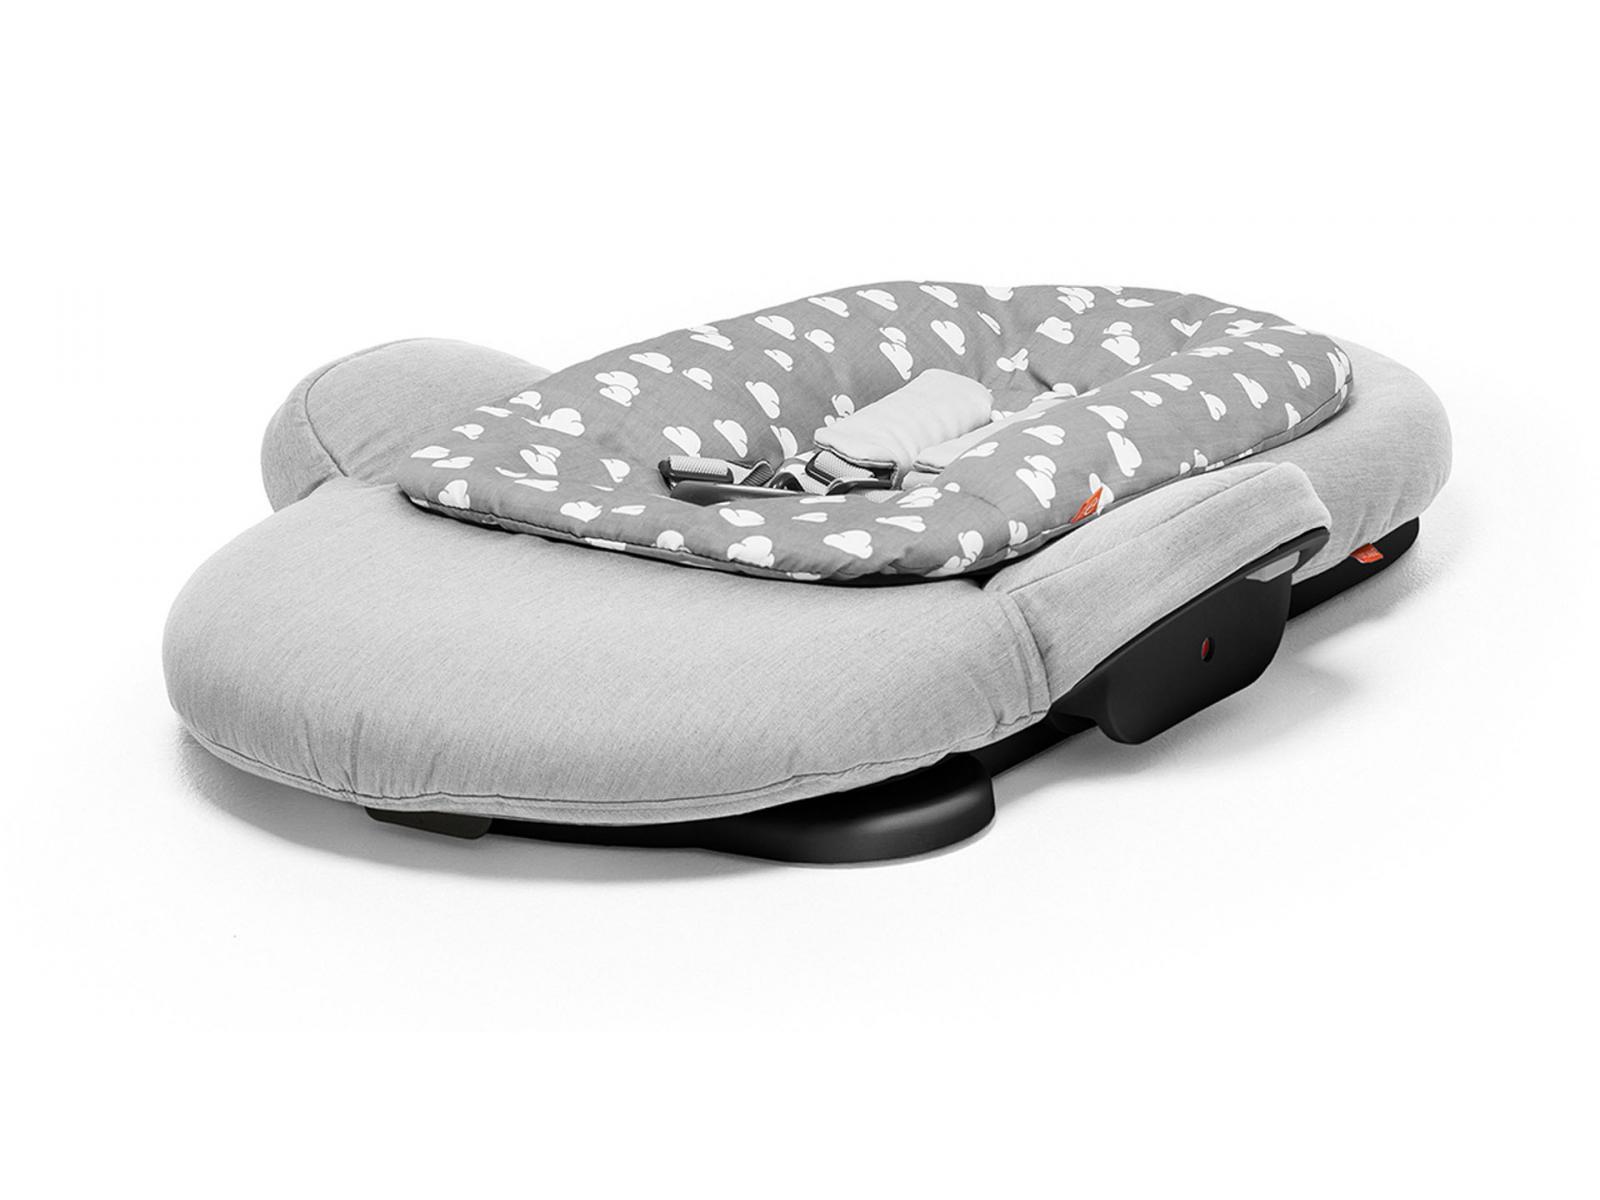 stokke transat stokke steps tm couleur gris nuage avec armature en noir. Black Bedroom Furniture Sets. Home Design Ideas